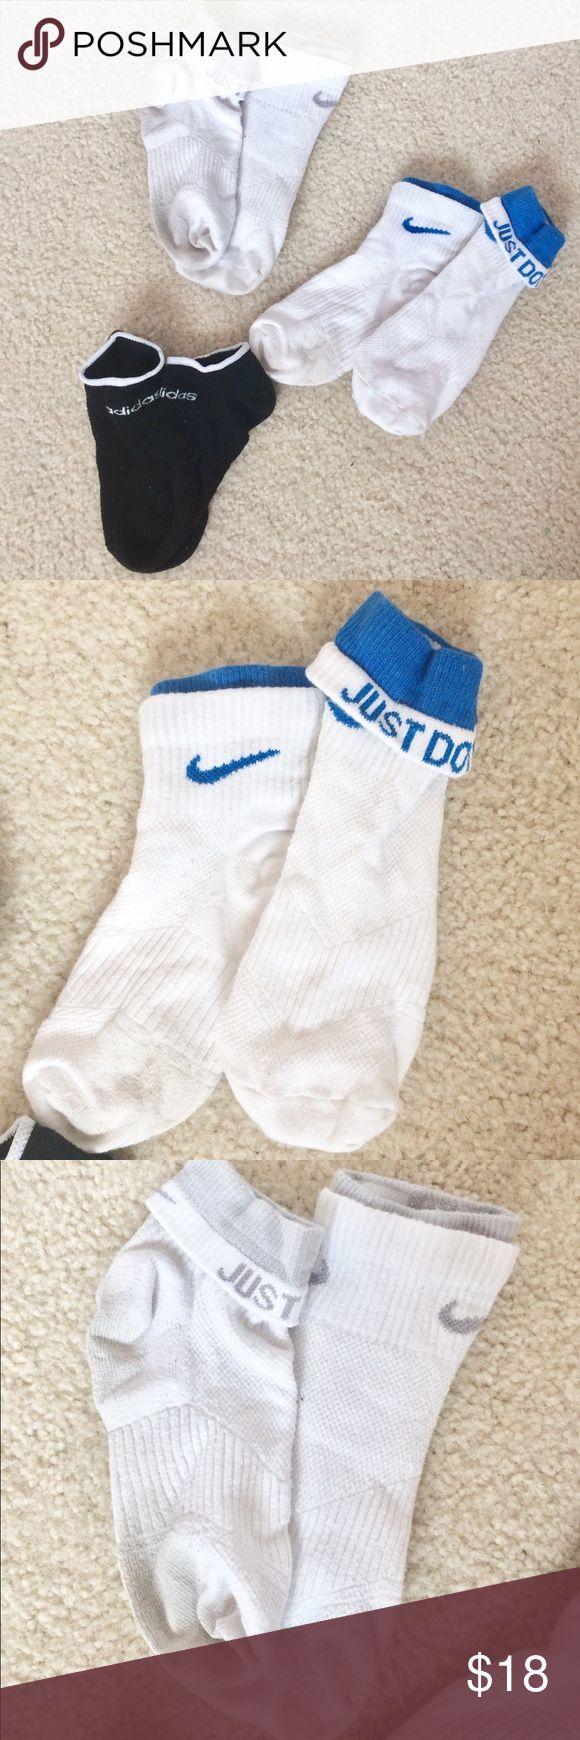 Nike Ankle Socks White and Black Adidas Sock 47 Black